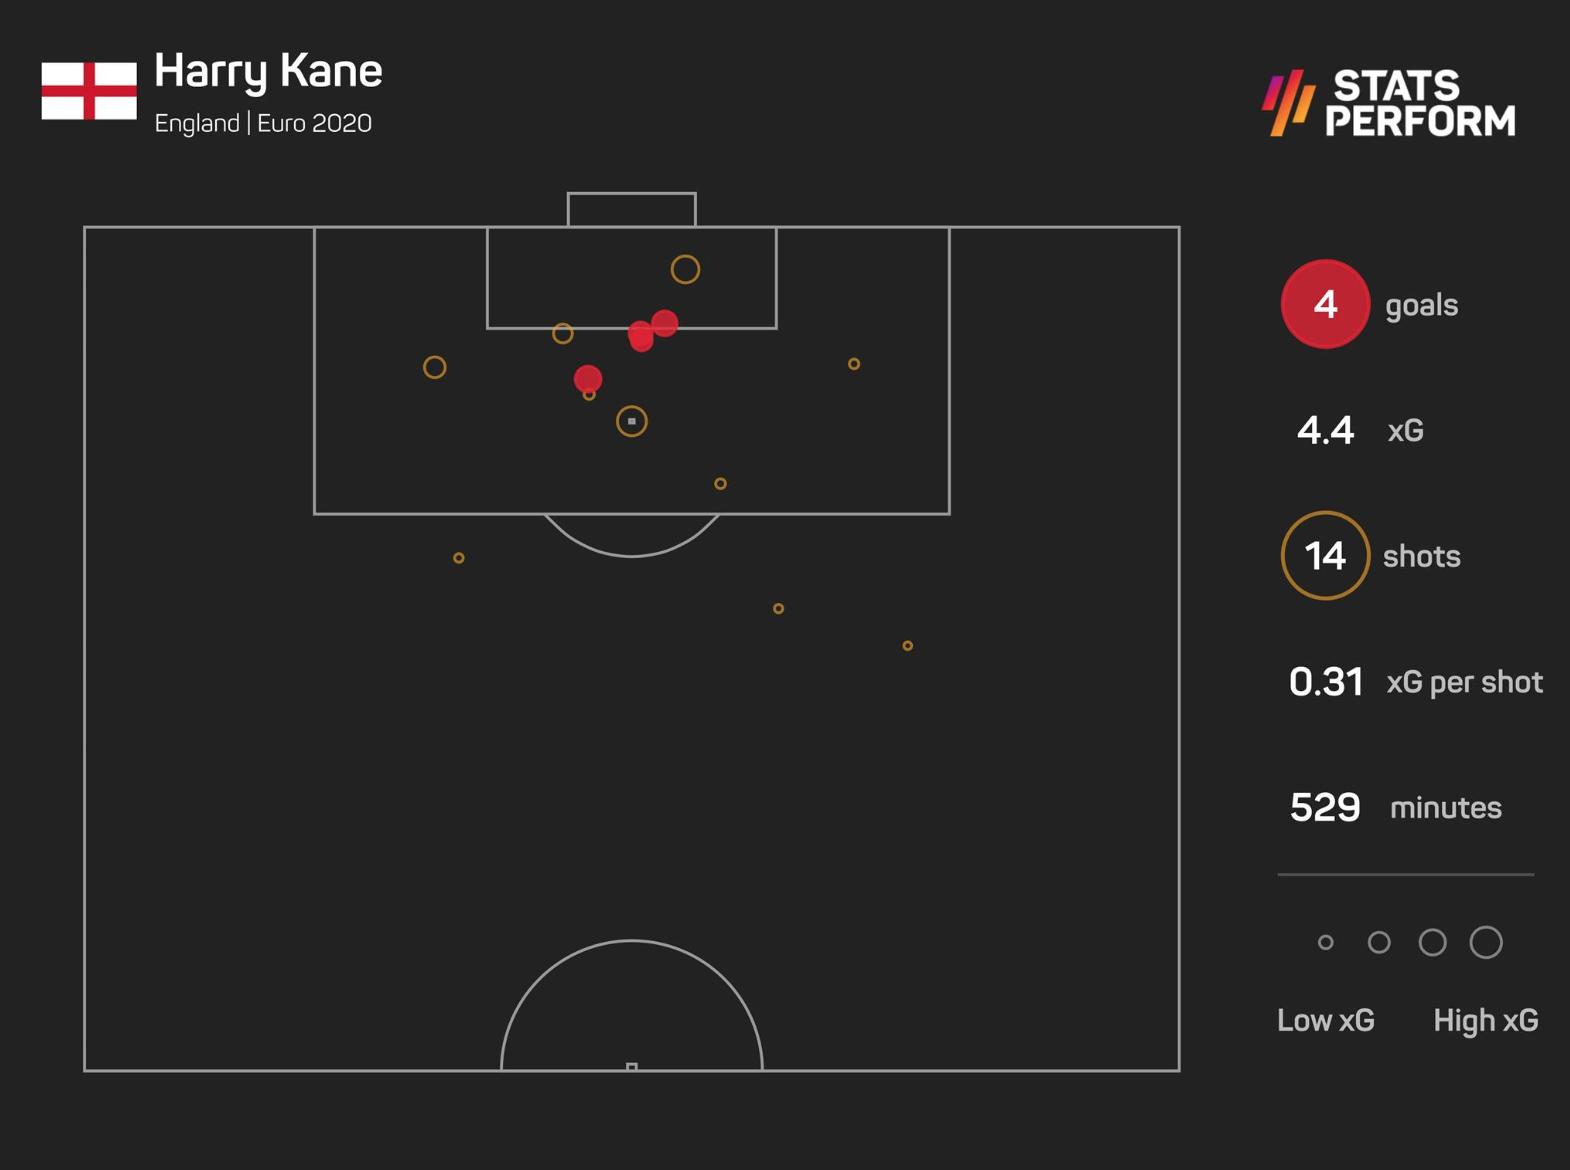 Harry Kane's four goals at Euro 2020